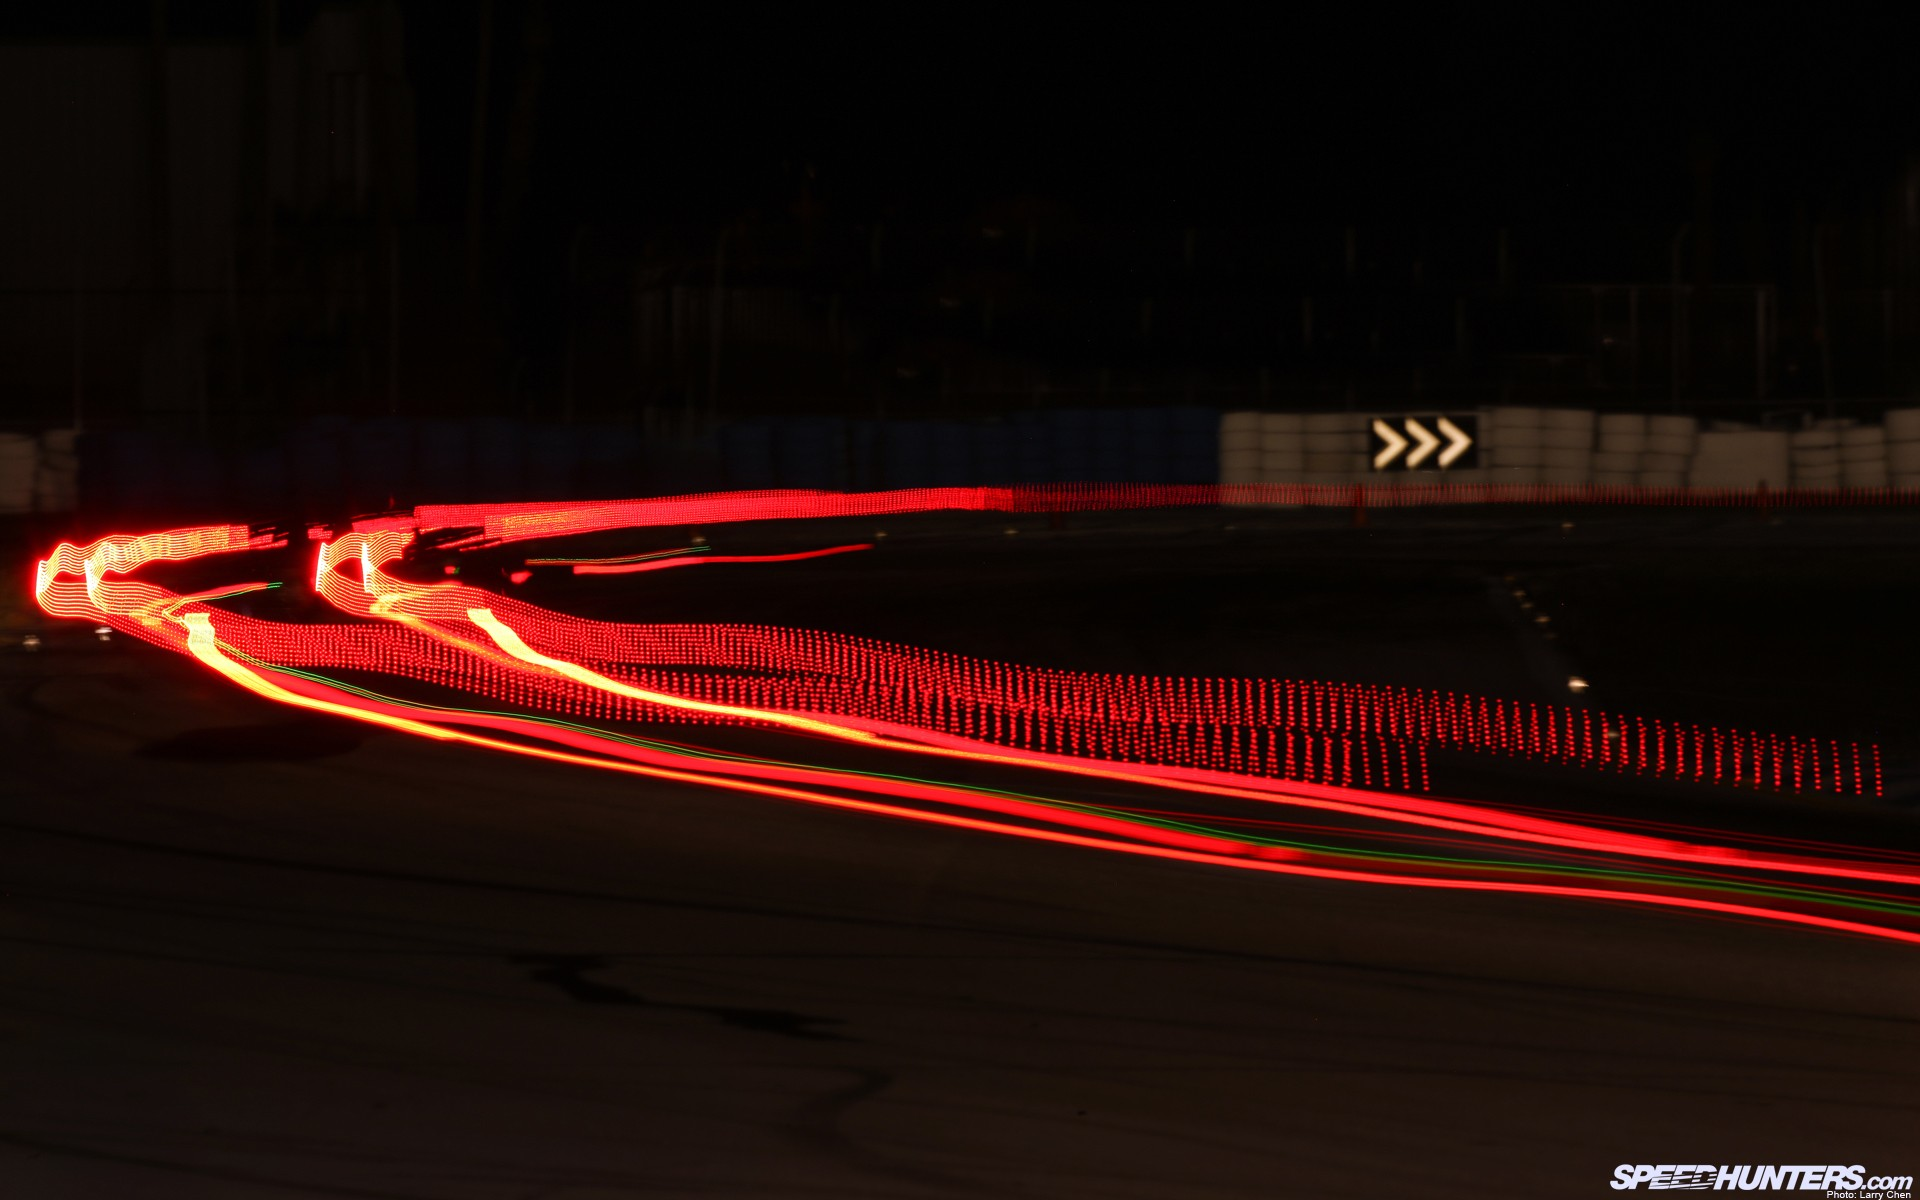 Cfree Cameros Racing Car Wallpapers Wallpaper Night Car Red Long Exposure Neon Sign